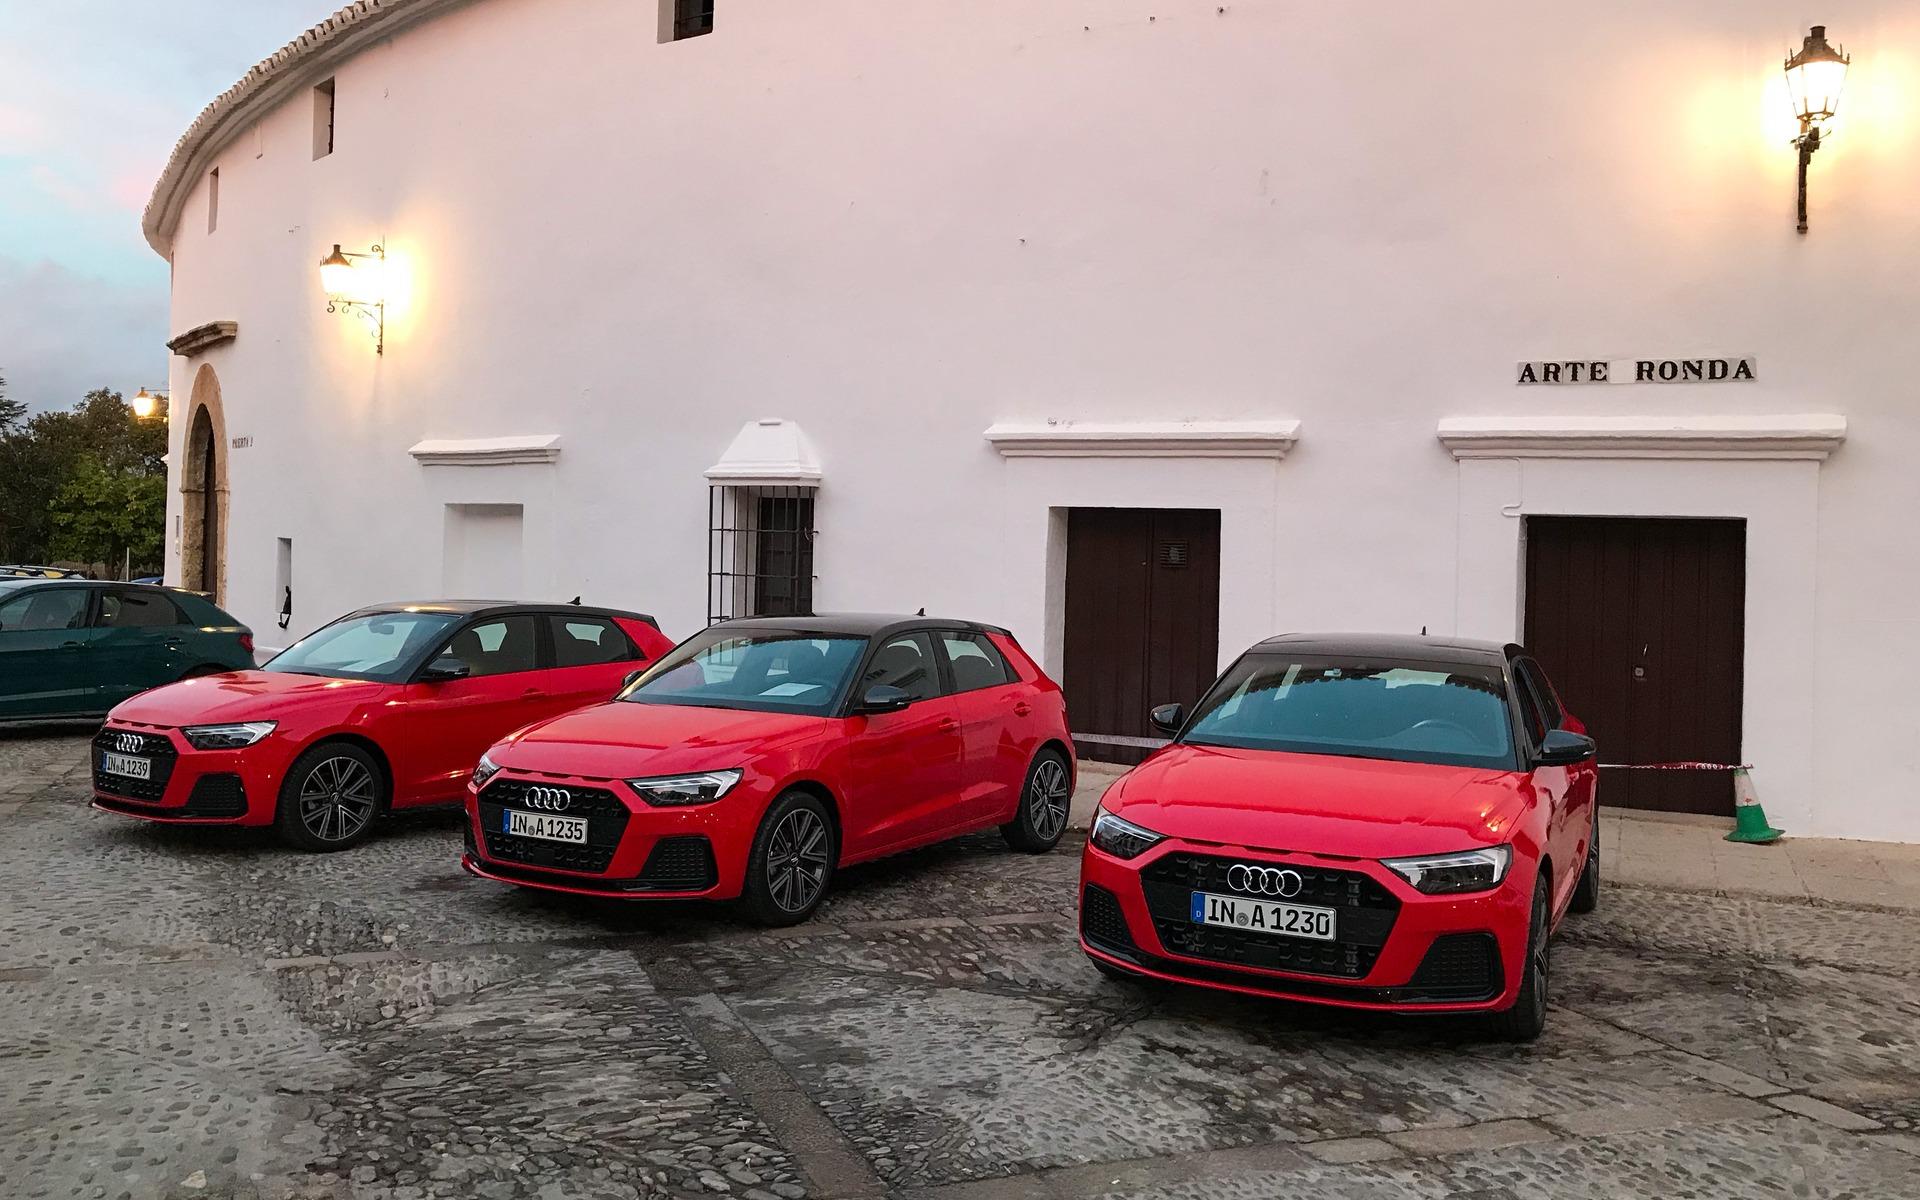 Audi A1 Sportback : la jolie petite qui ne viendra pas 357332_Audi_A1